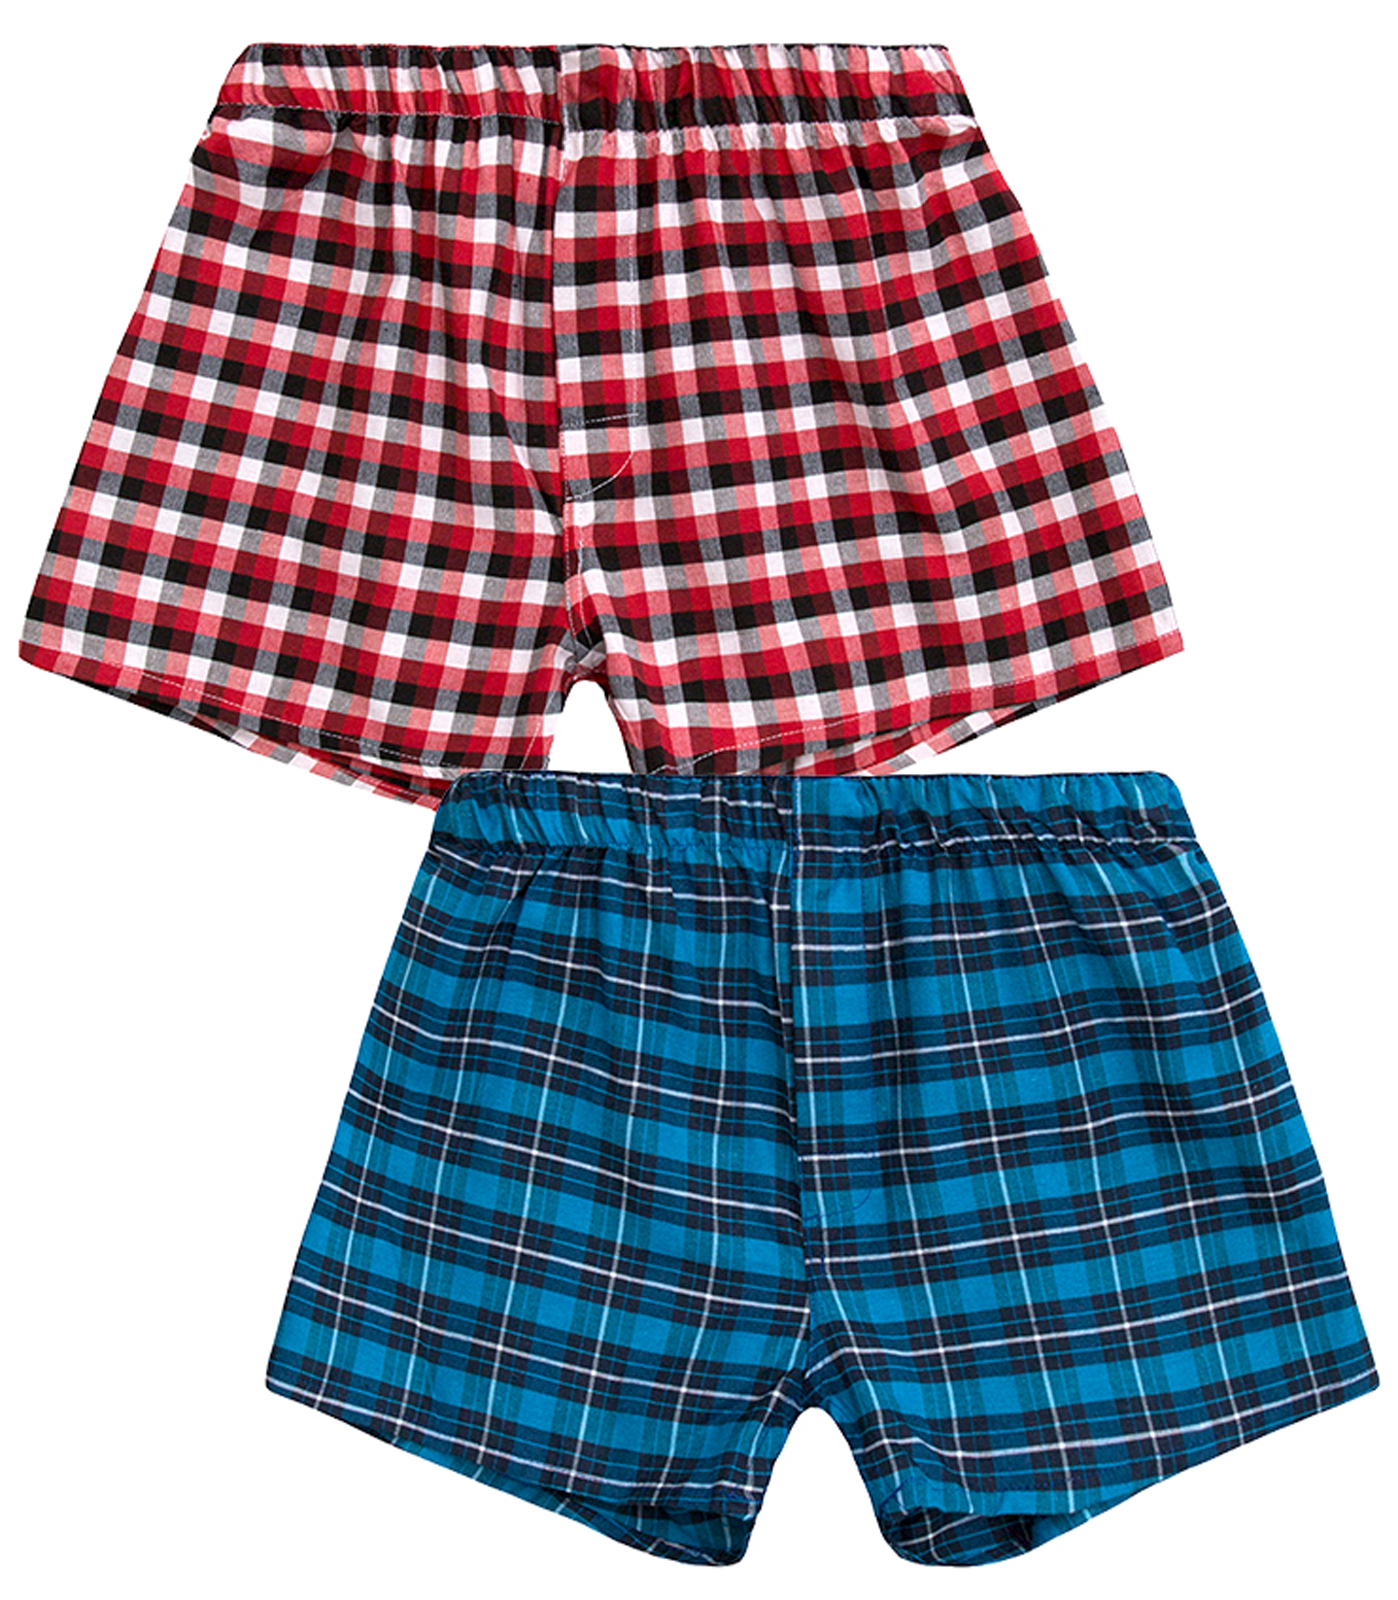 fb7b454aef Boys 2 Pack Woven Boxer Shorts Cotton Blend Underwear Trunks Kids ...